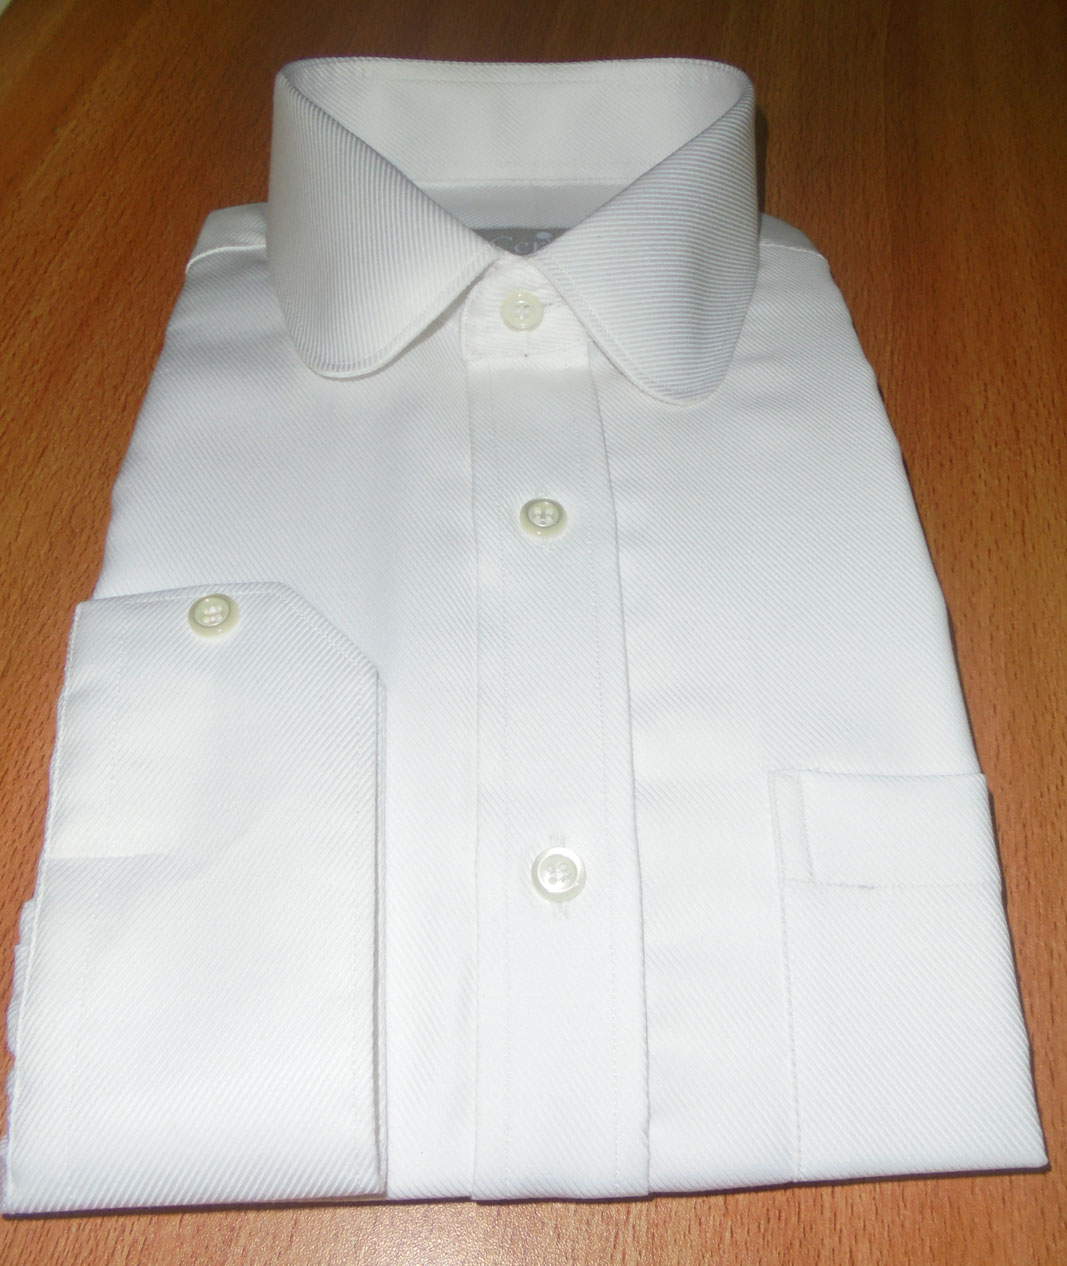 Round Collar Shirt,Vintage Club Collar Shirt,Eton Collar ...